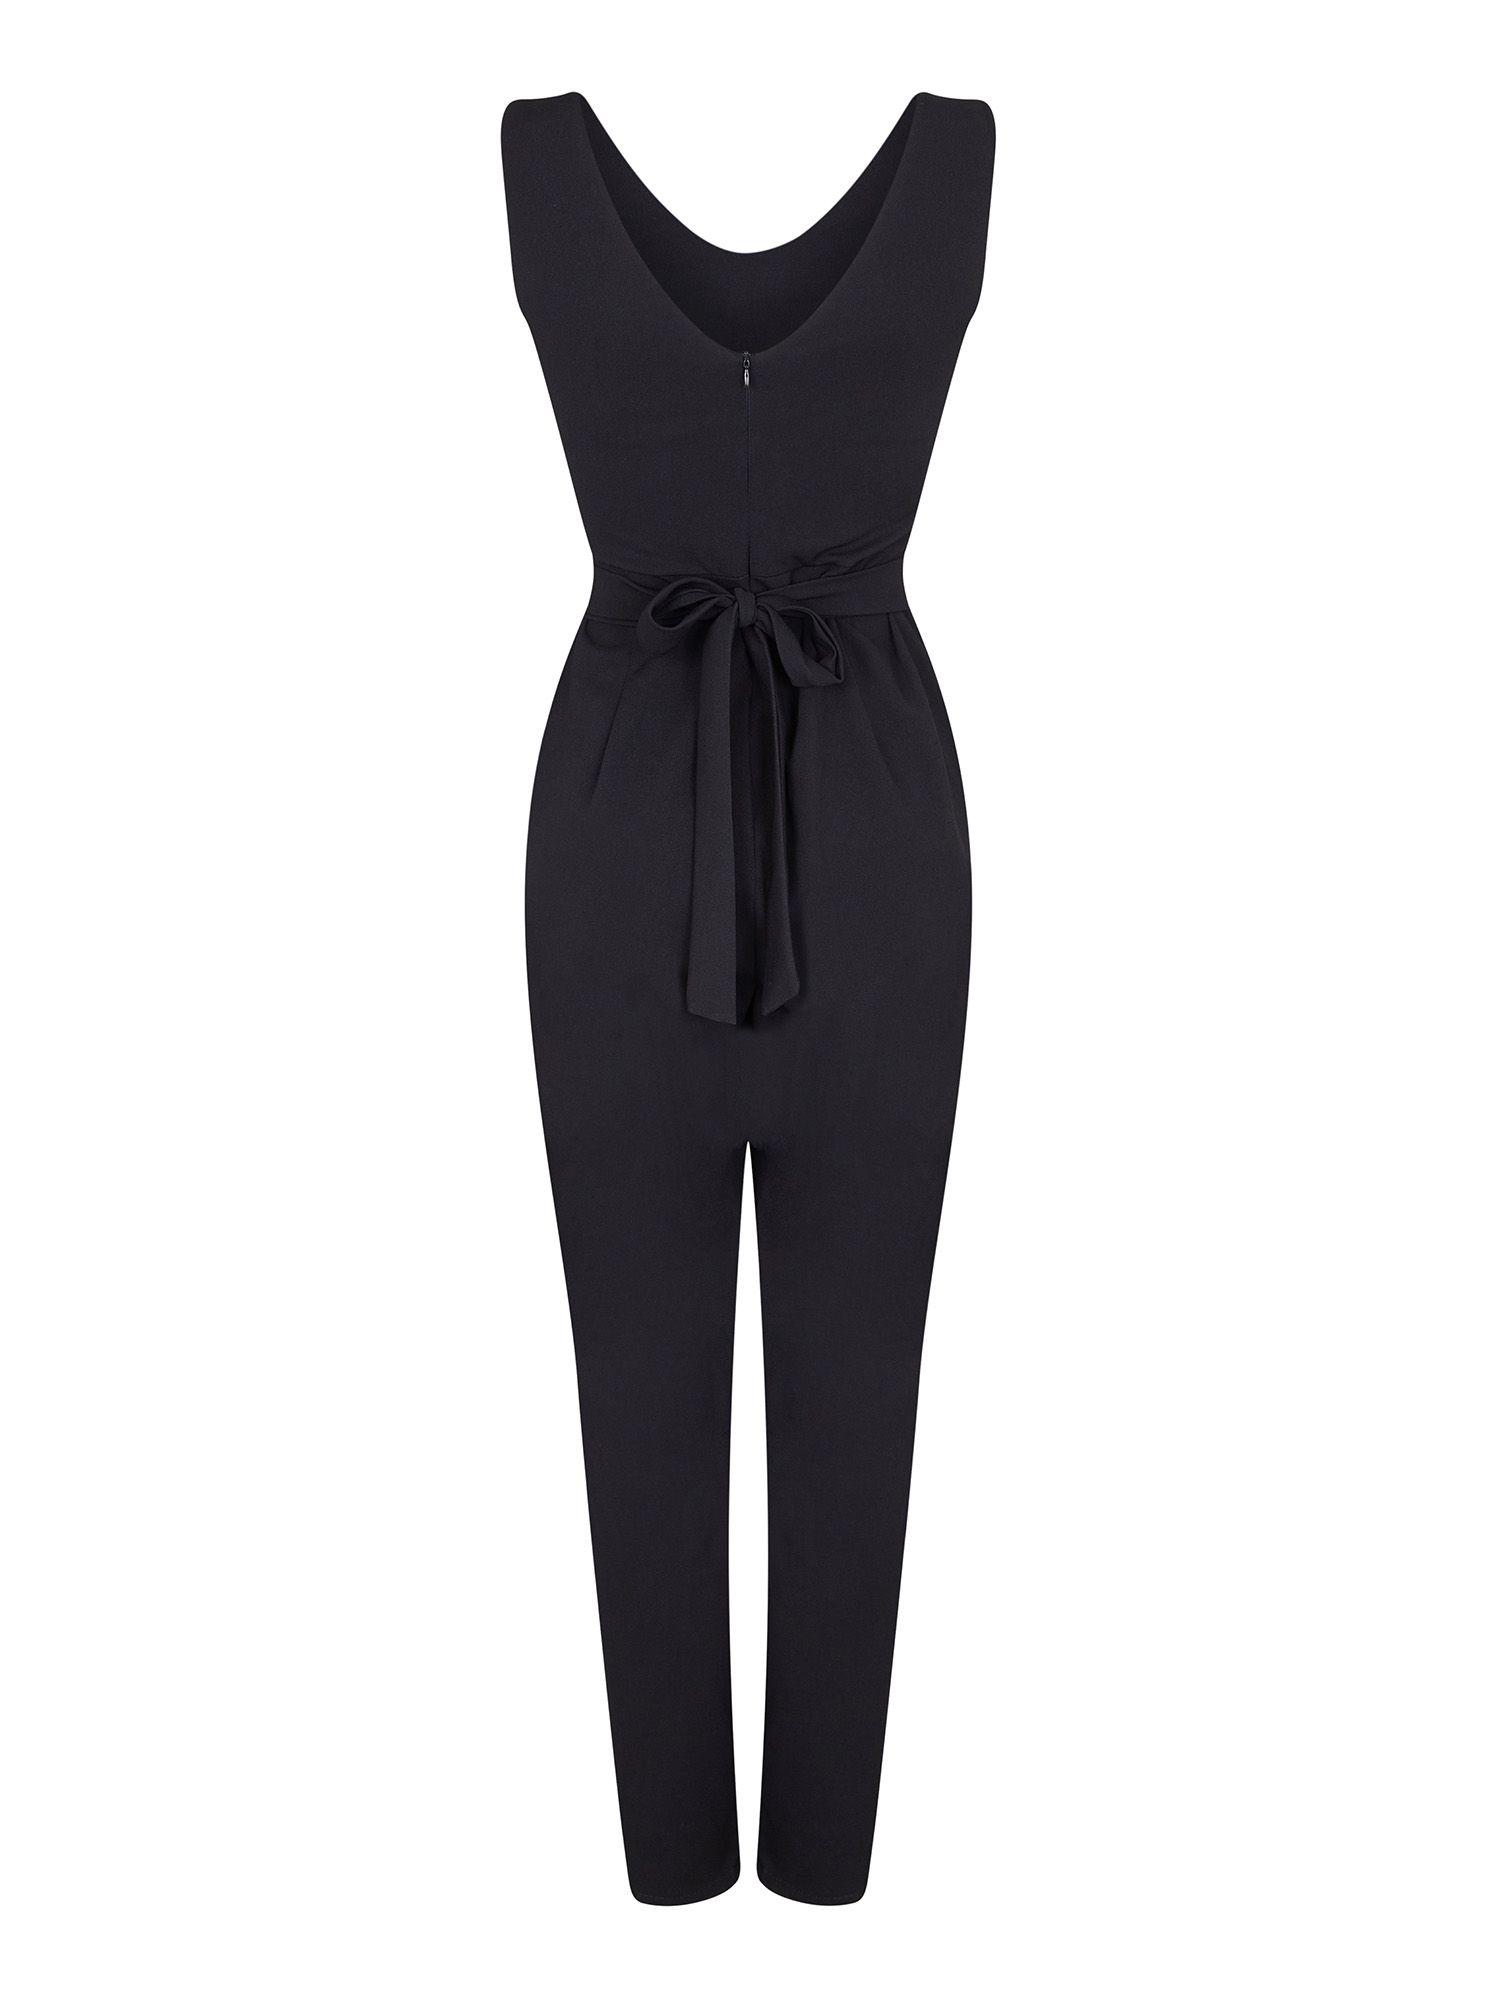 Mesh Detail Sleeveless Jumpsuit